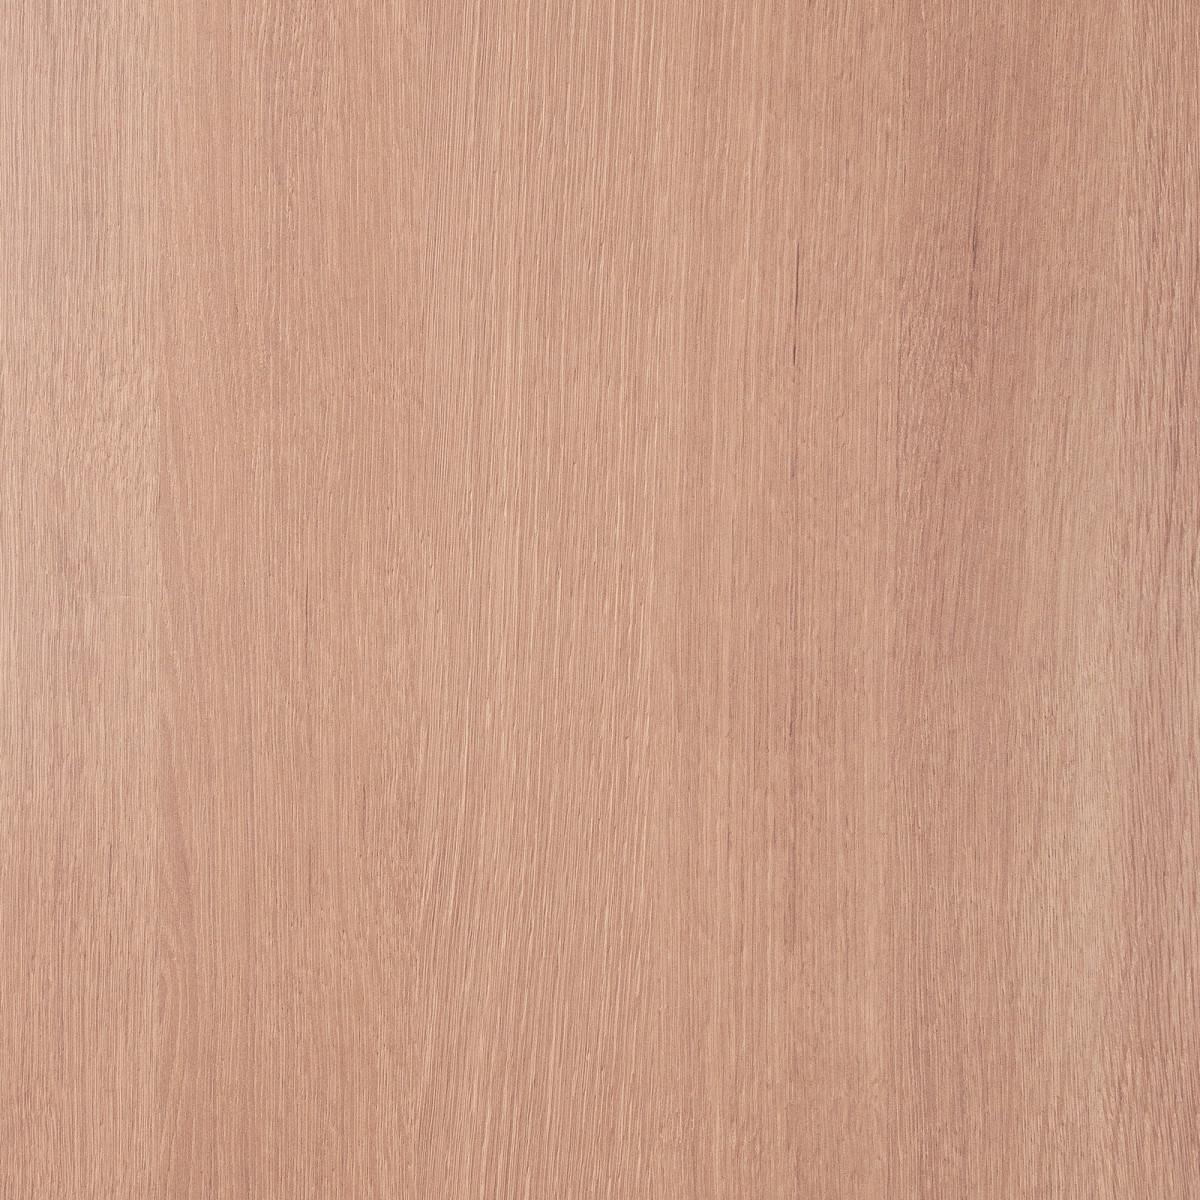 Дверь Межкомнатная Глухая 60x200 Ламинация Цвет Дуб Селект